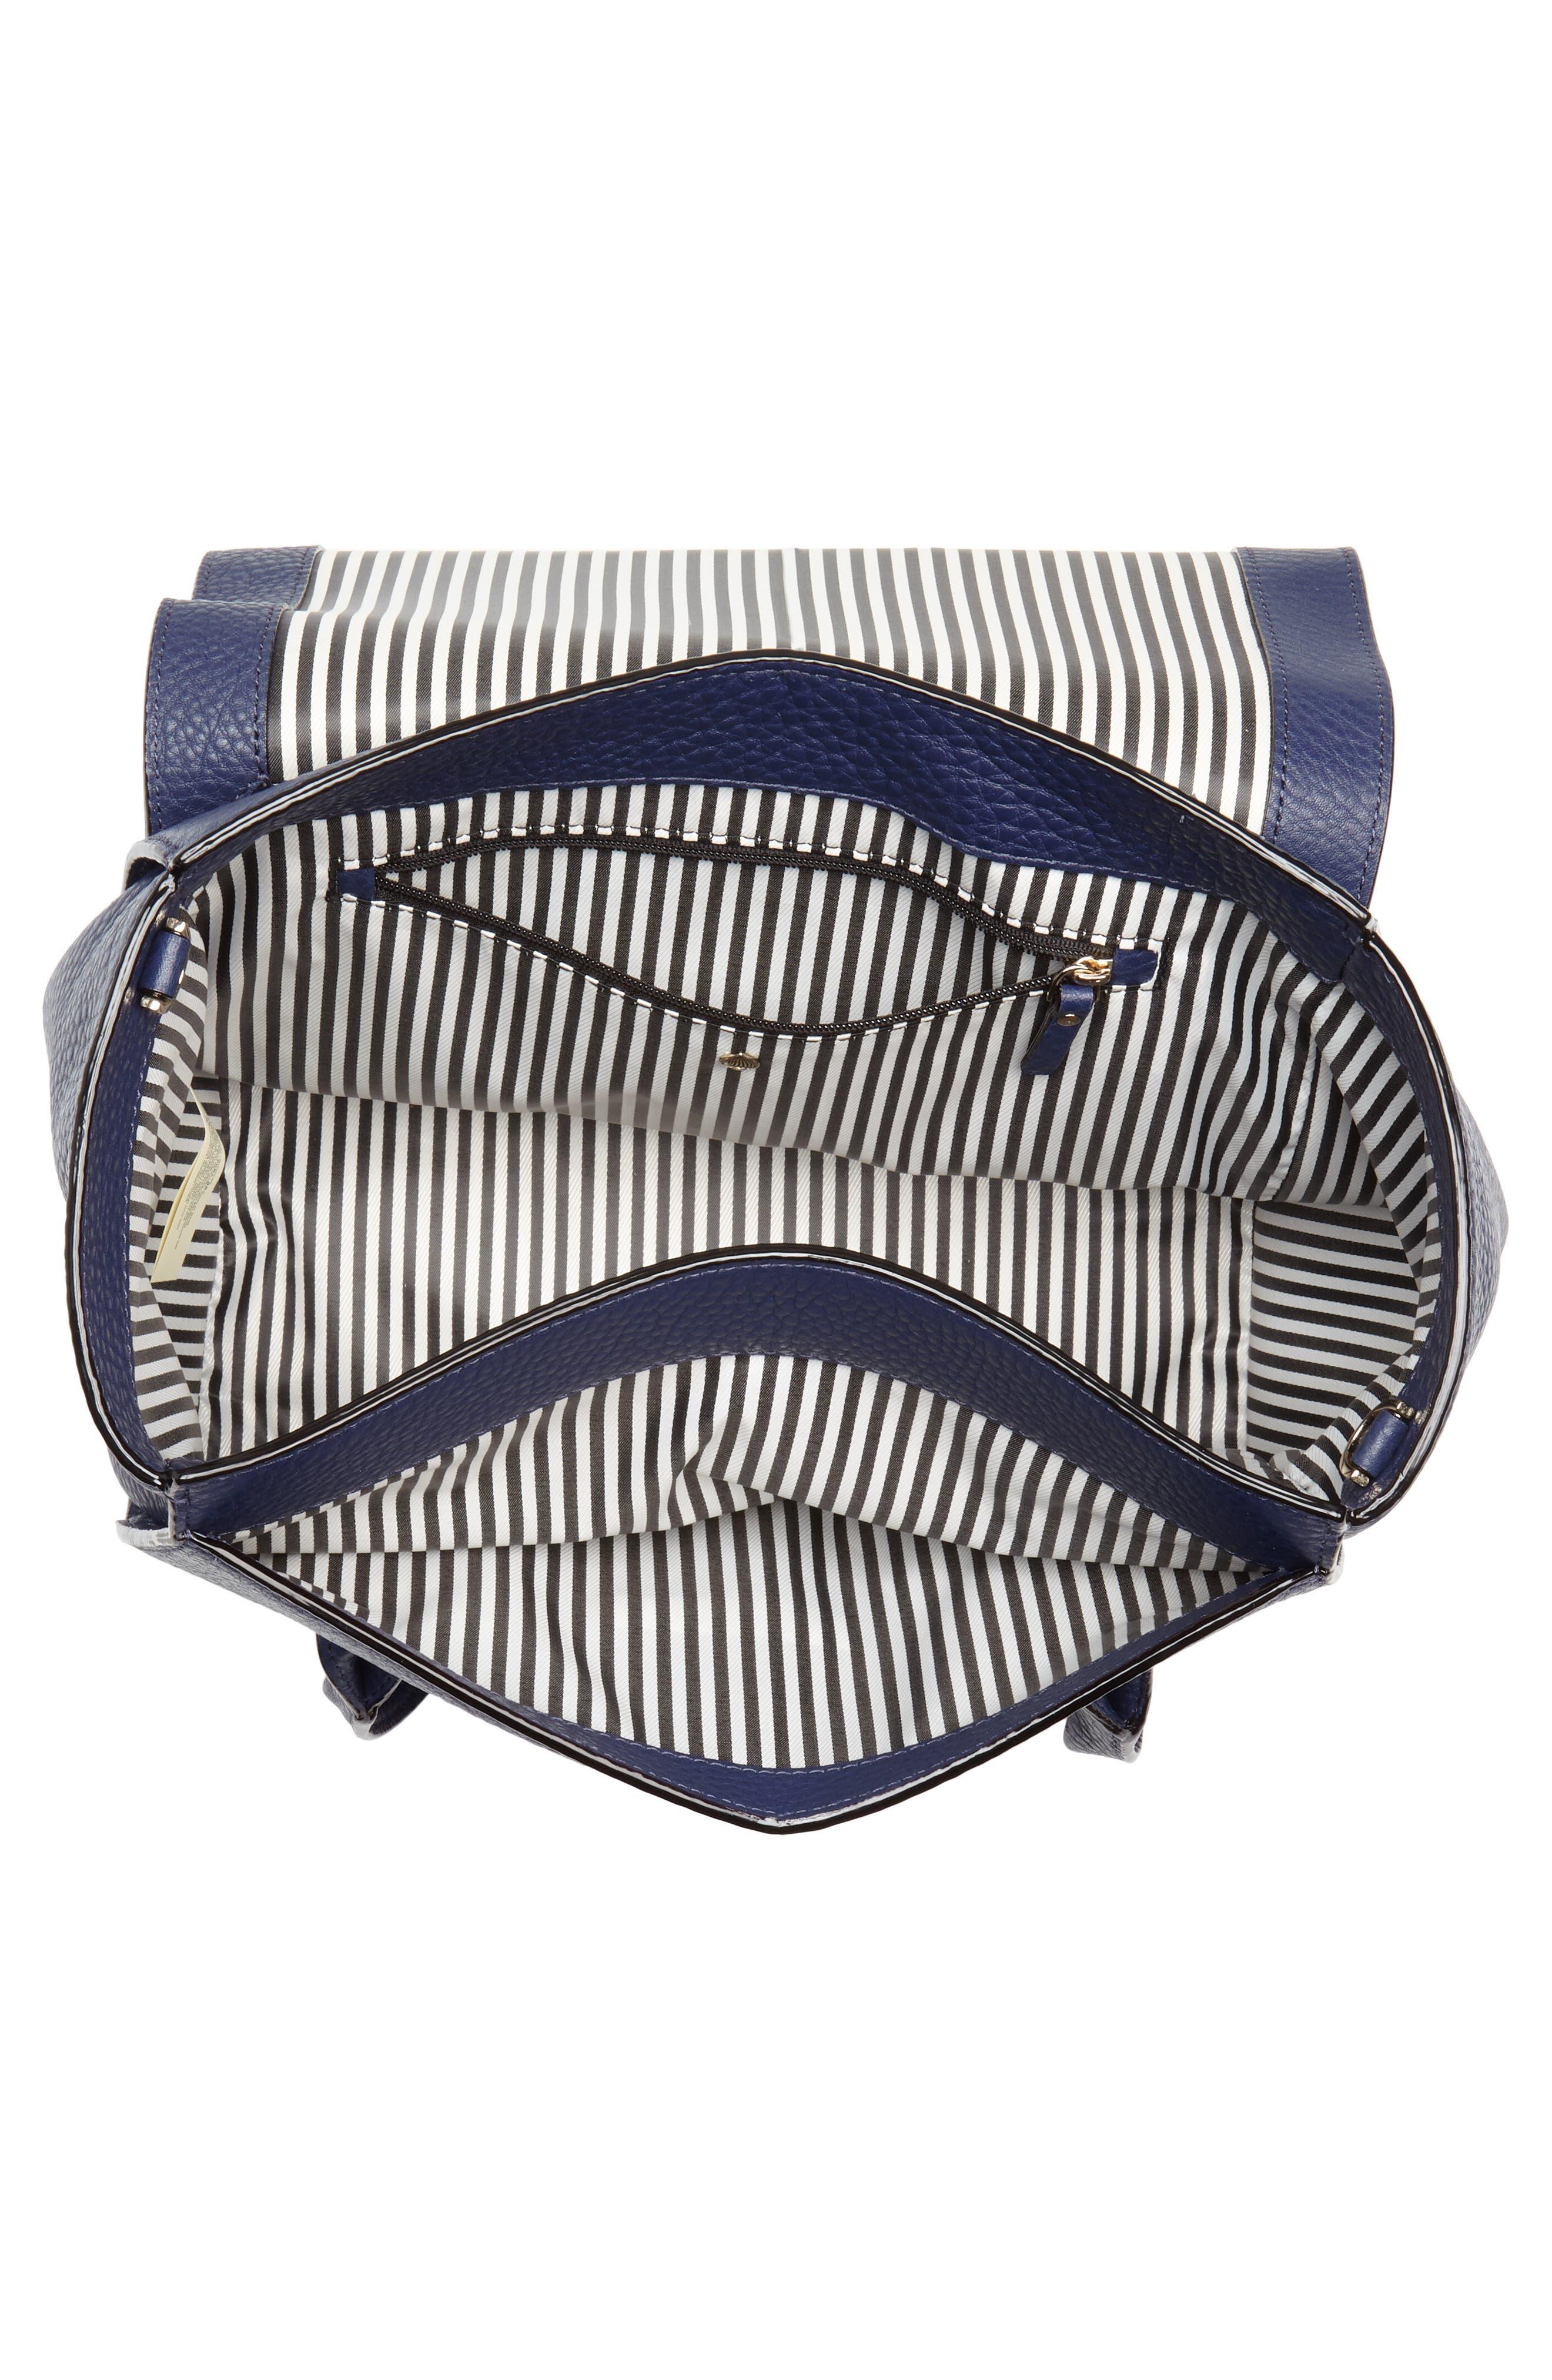 carlyle street - alexa leather satchel,                             Alternate thumbnail 8, color,